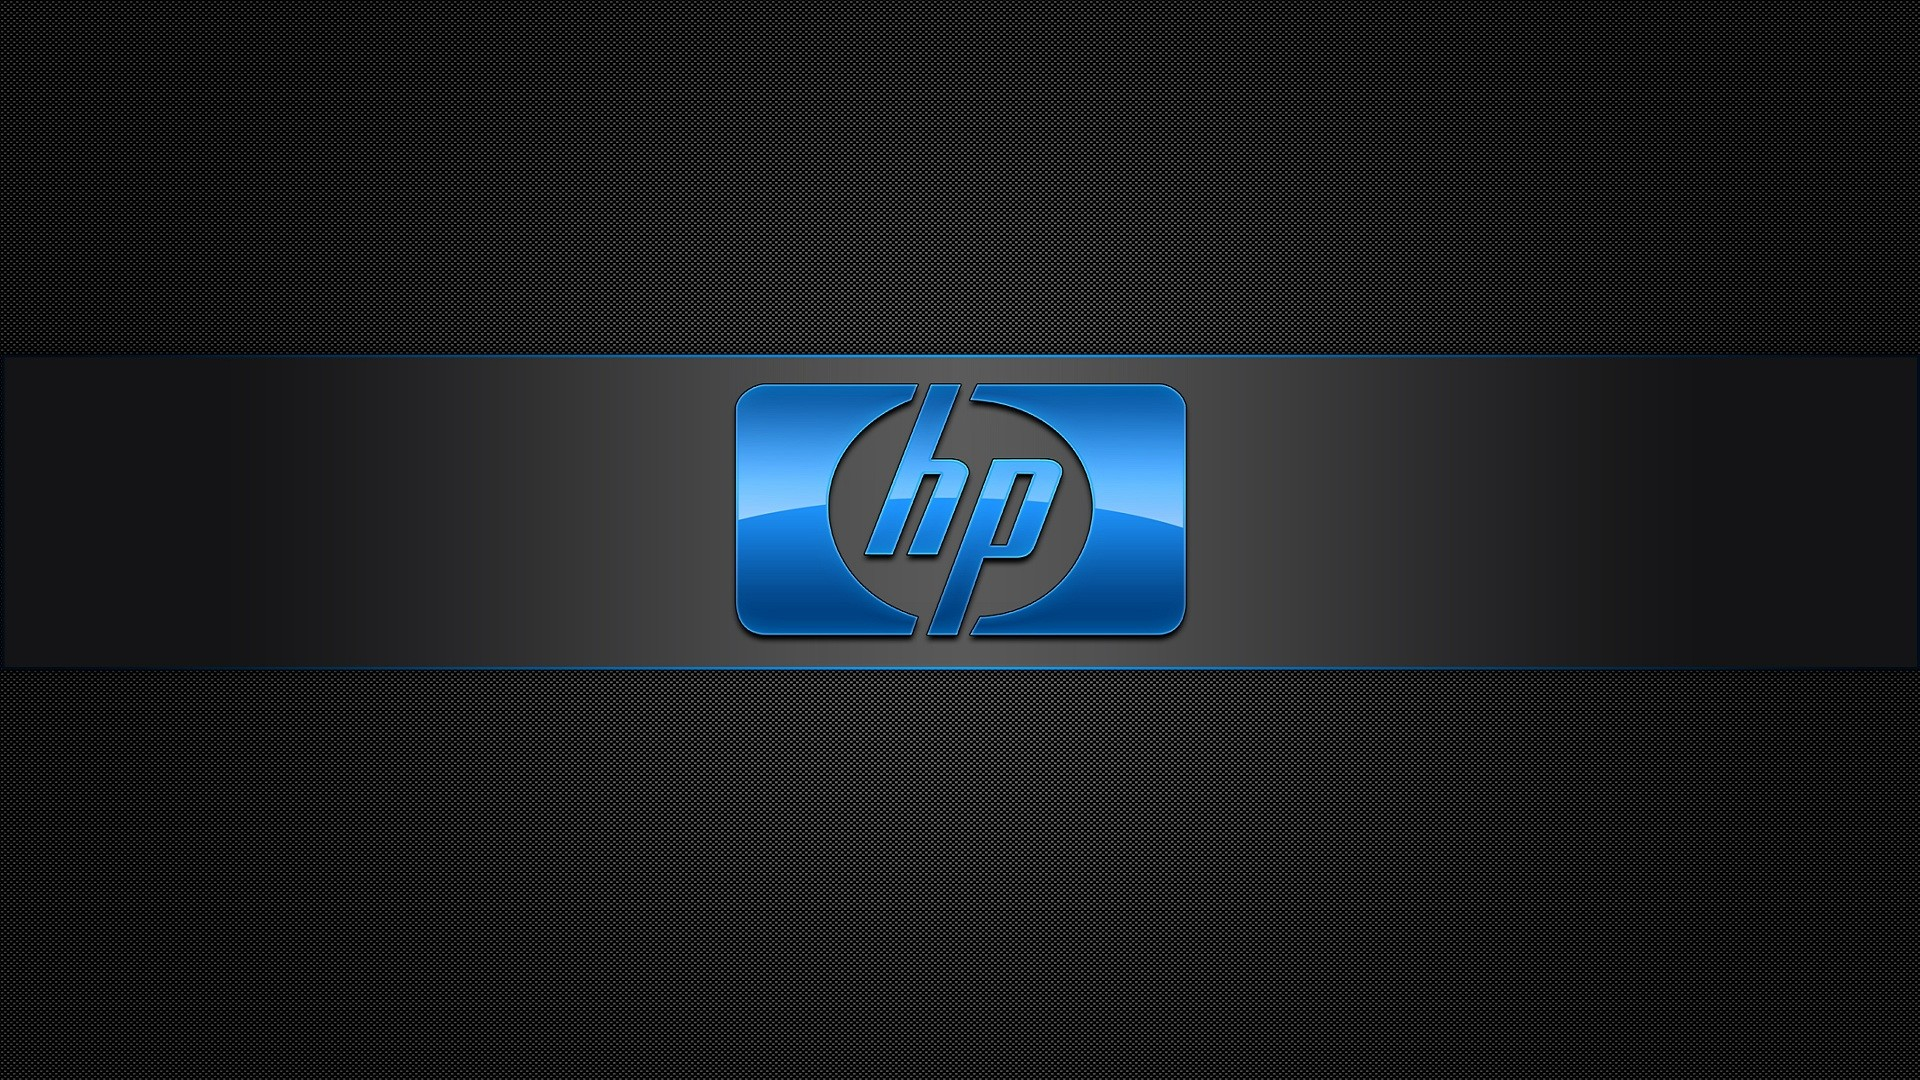 hp desktop wallpaper, fondos de pantalla para pc 4k